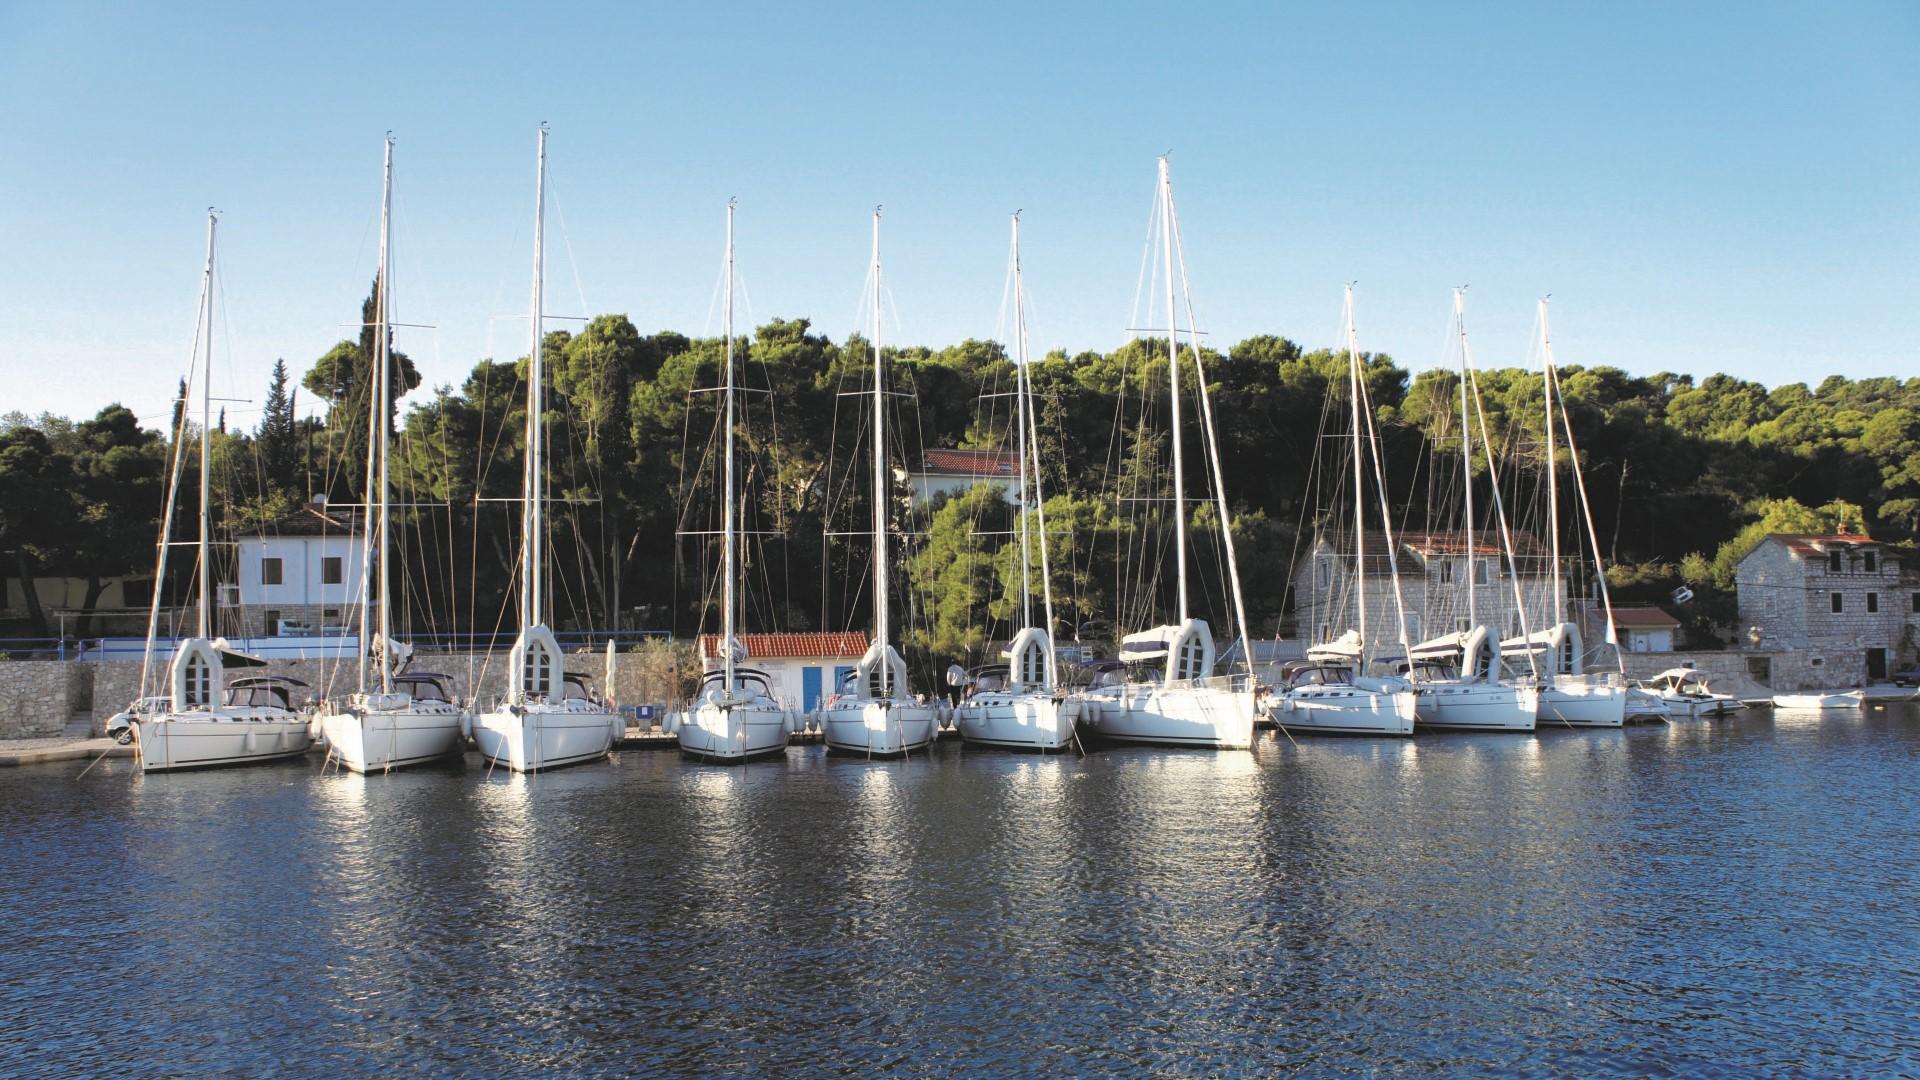 Beneteau Cyclades 43.4 (Niagara) Marina Rogač - sailboats (photo taken 2019) - 3